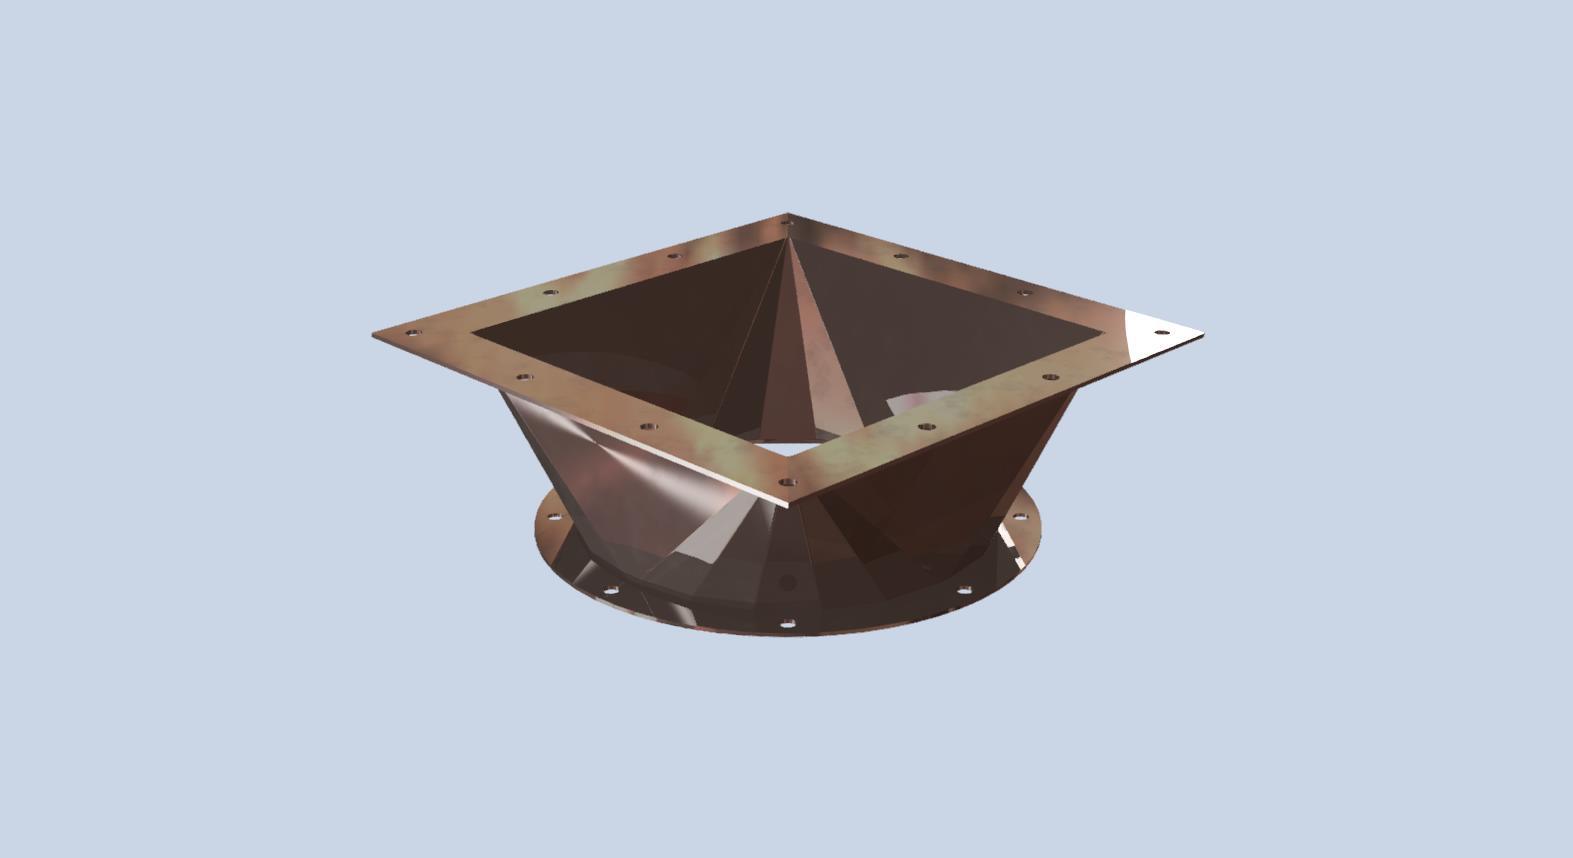 https://0201.nccdn.net/1_2/000/000/0ba/578/existing-conveyor-to-spout-transition--002-.jpg